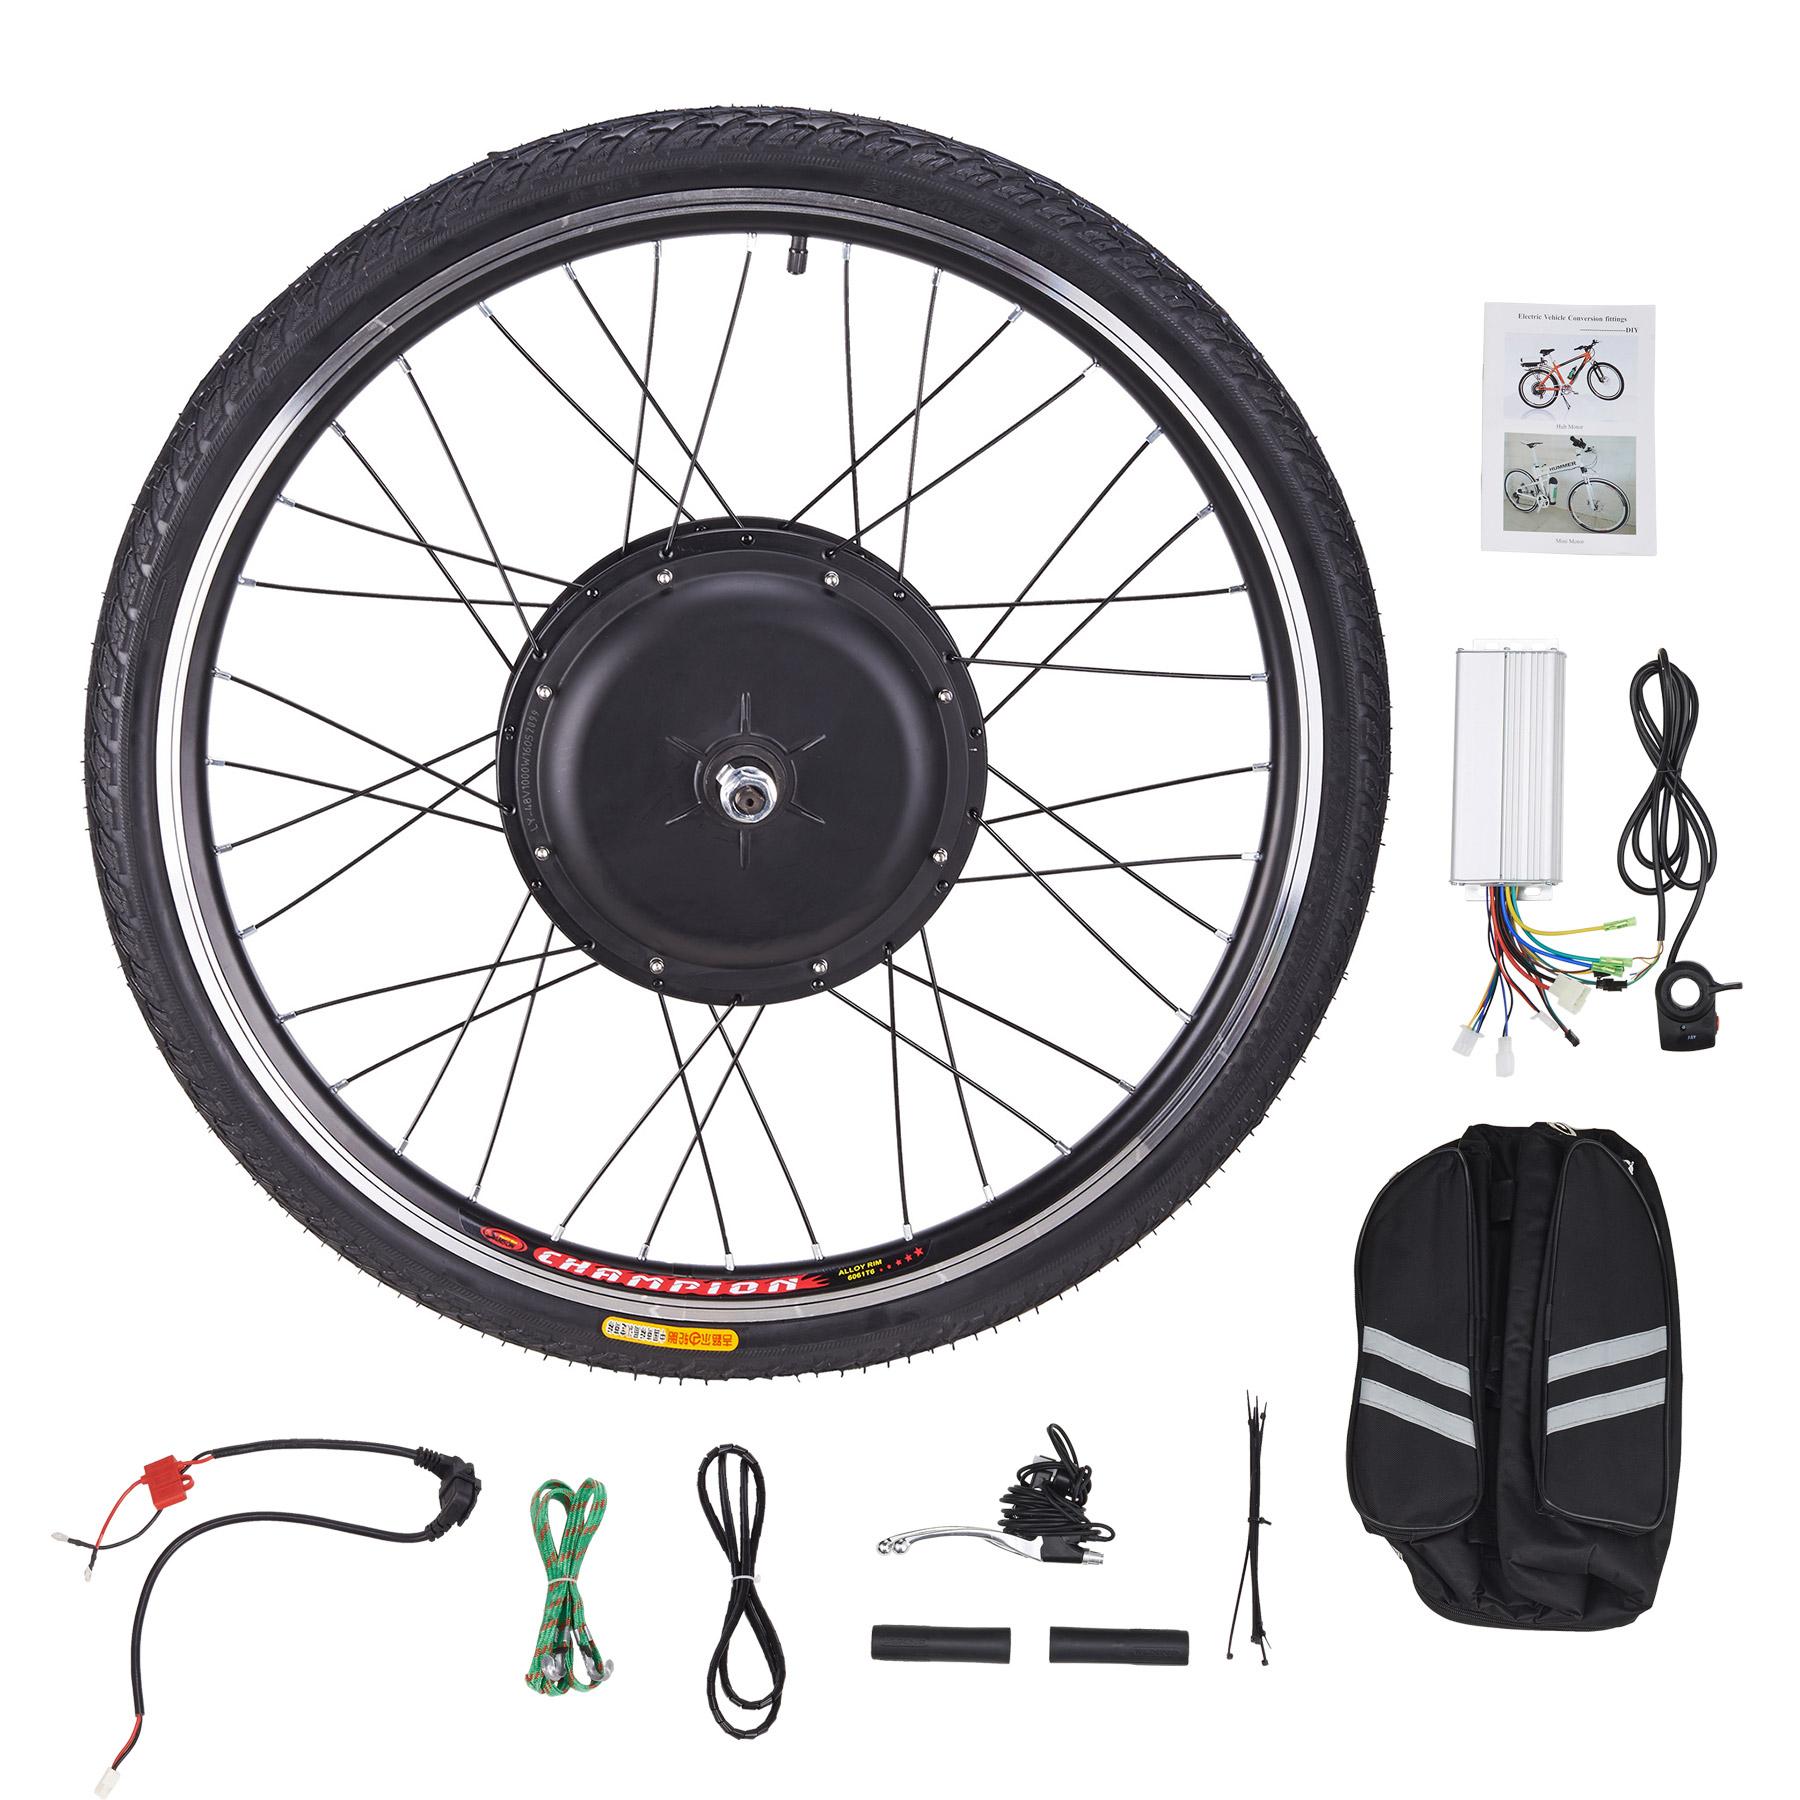 "48V 1000W 26"" Electronic Bike Conversion Kit for Front Wheel Motor Hub Control"